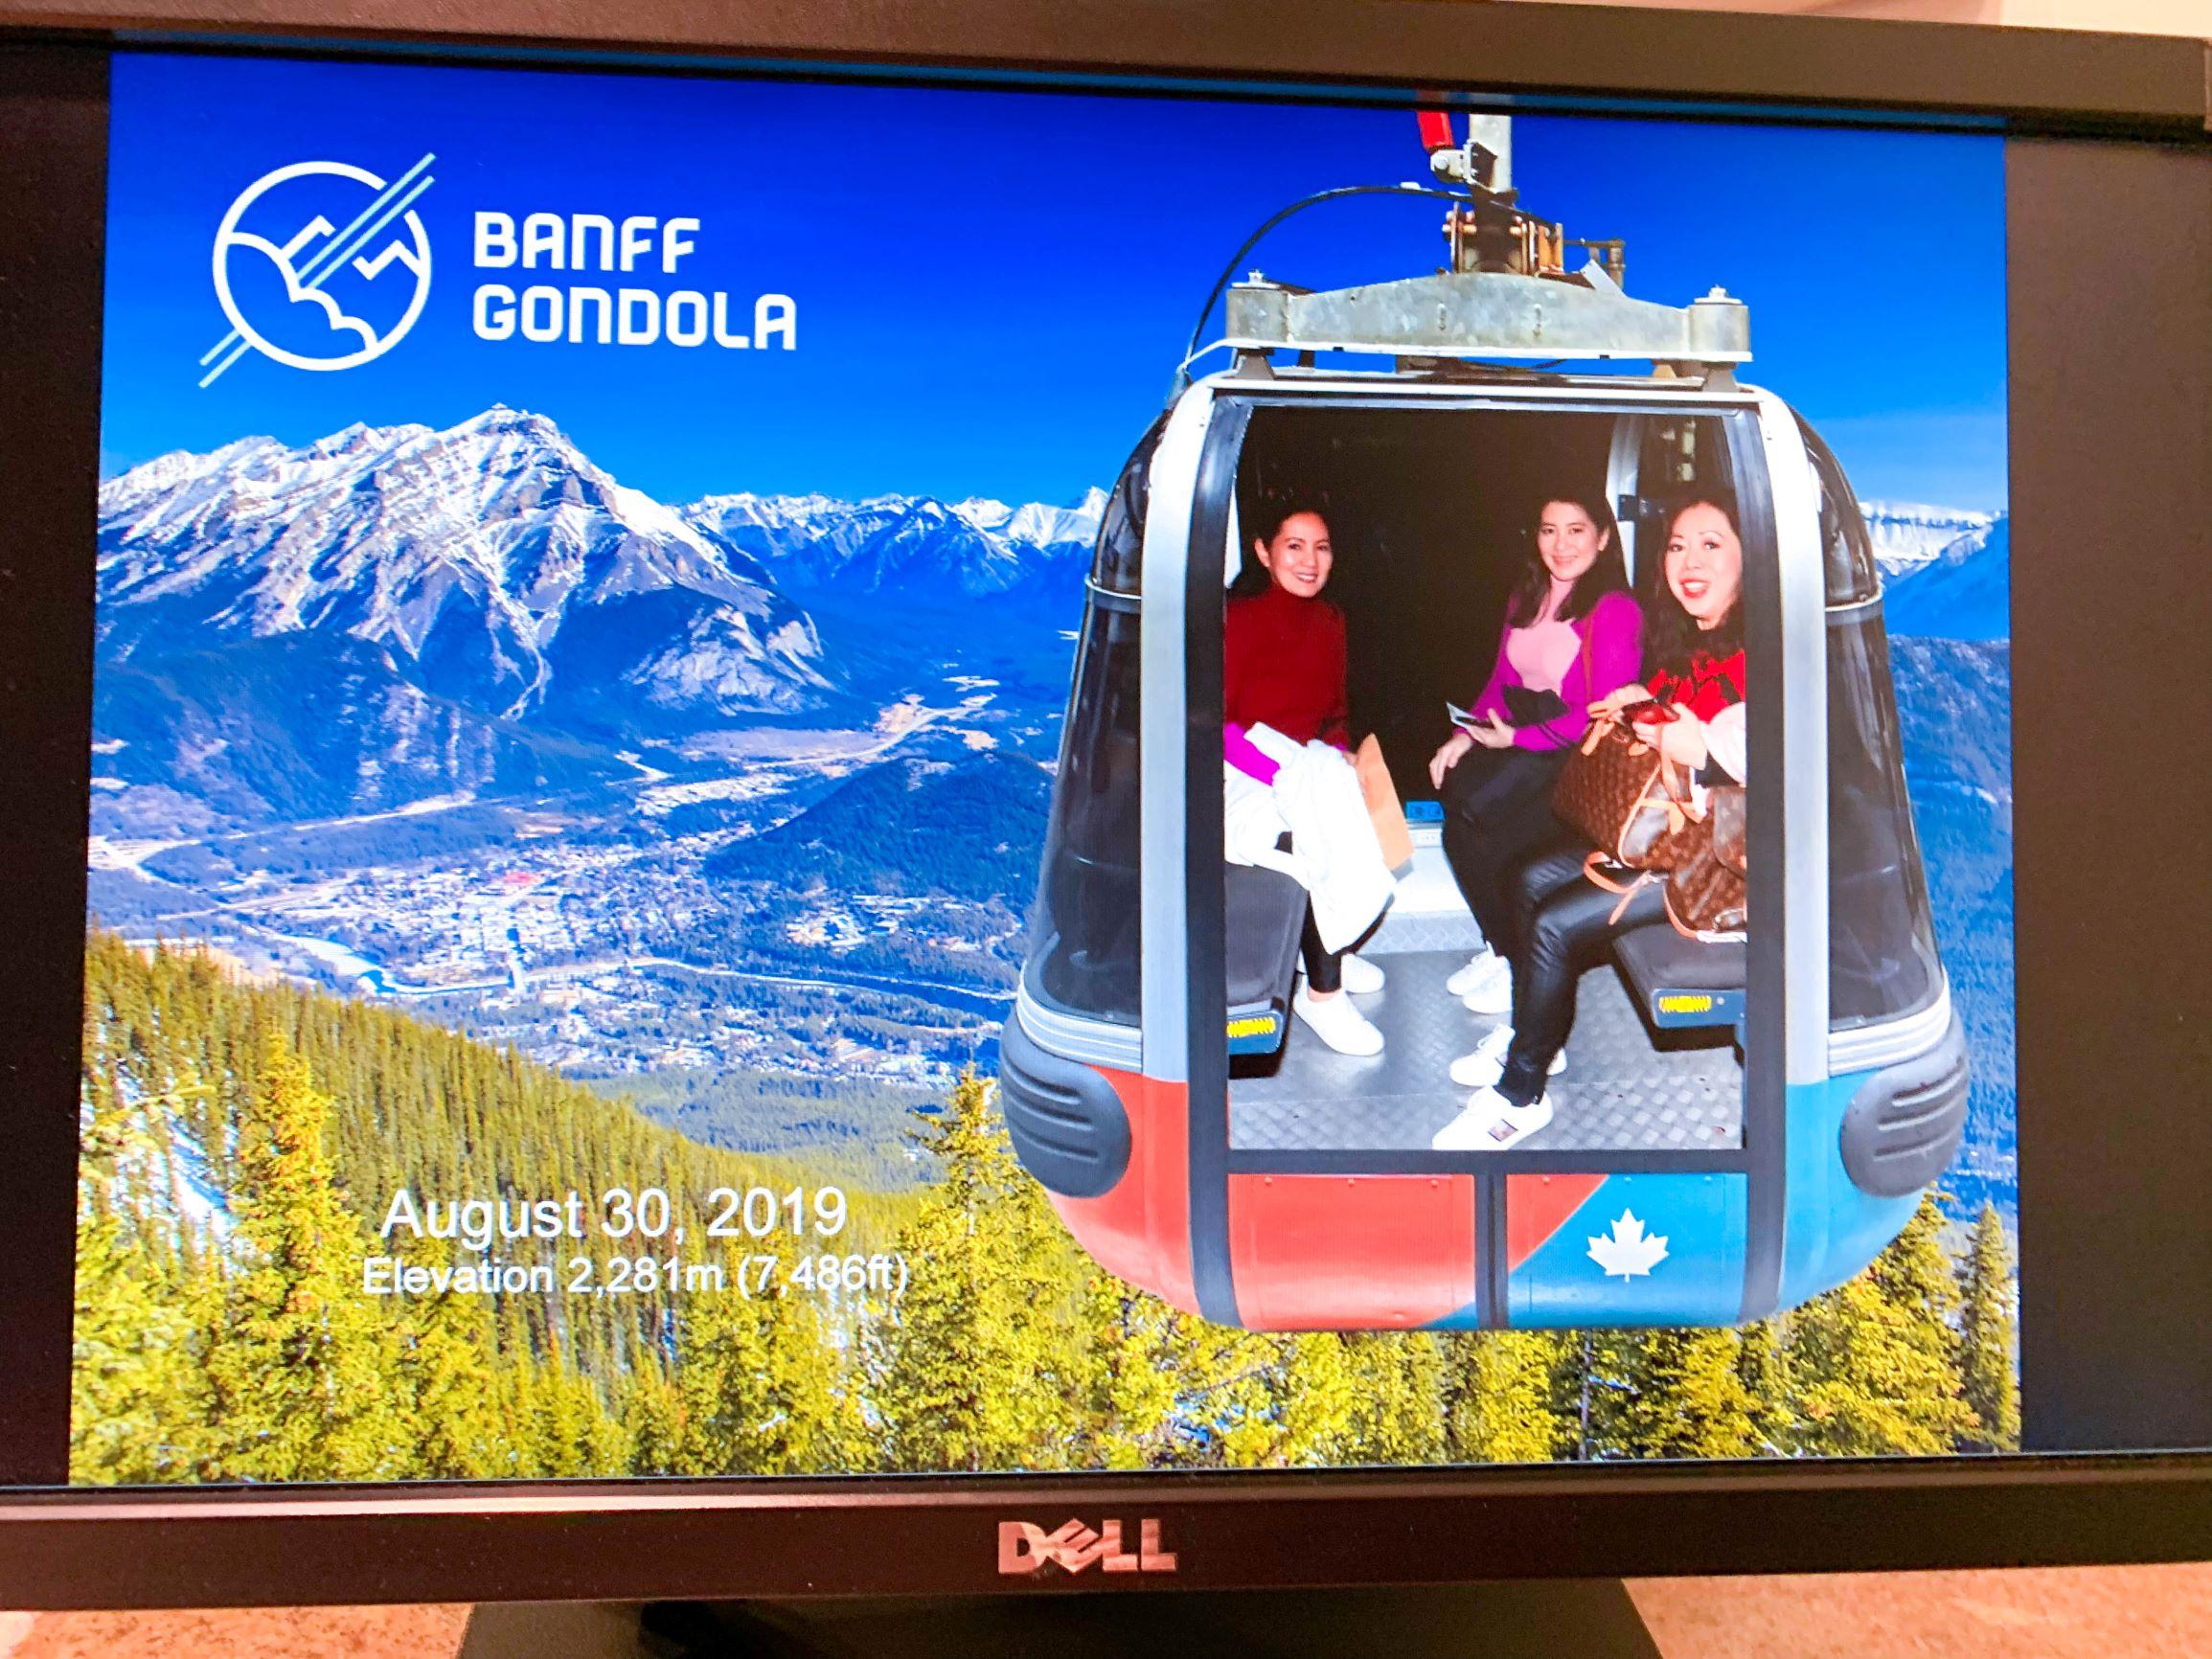 Banff Gondola picture